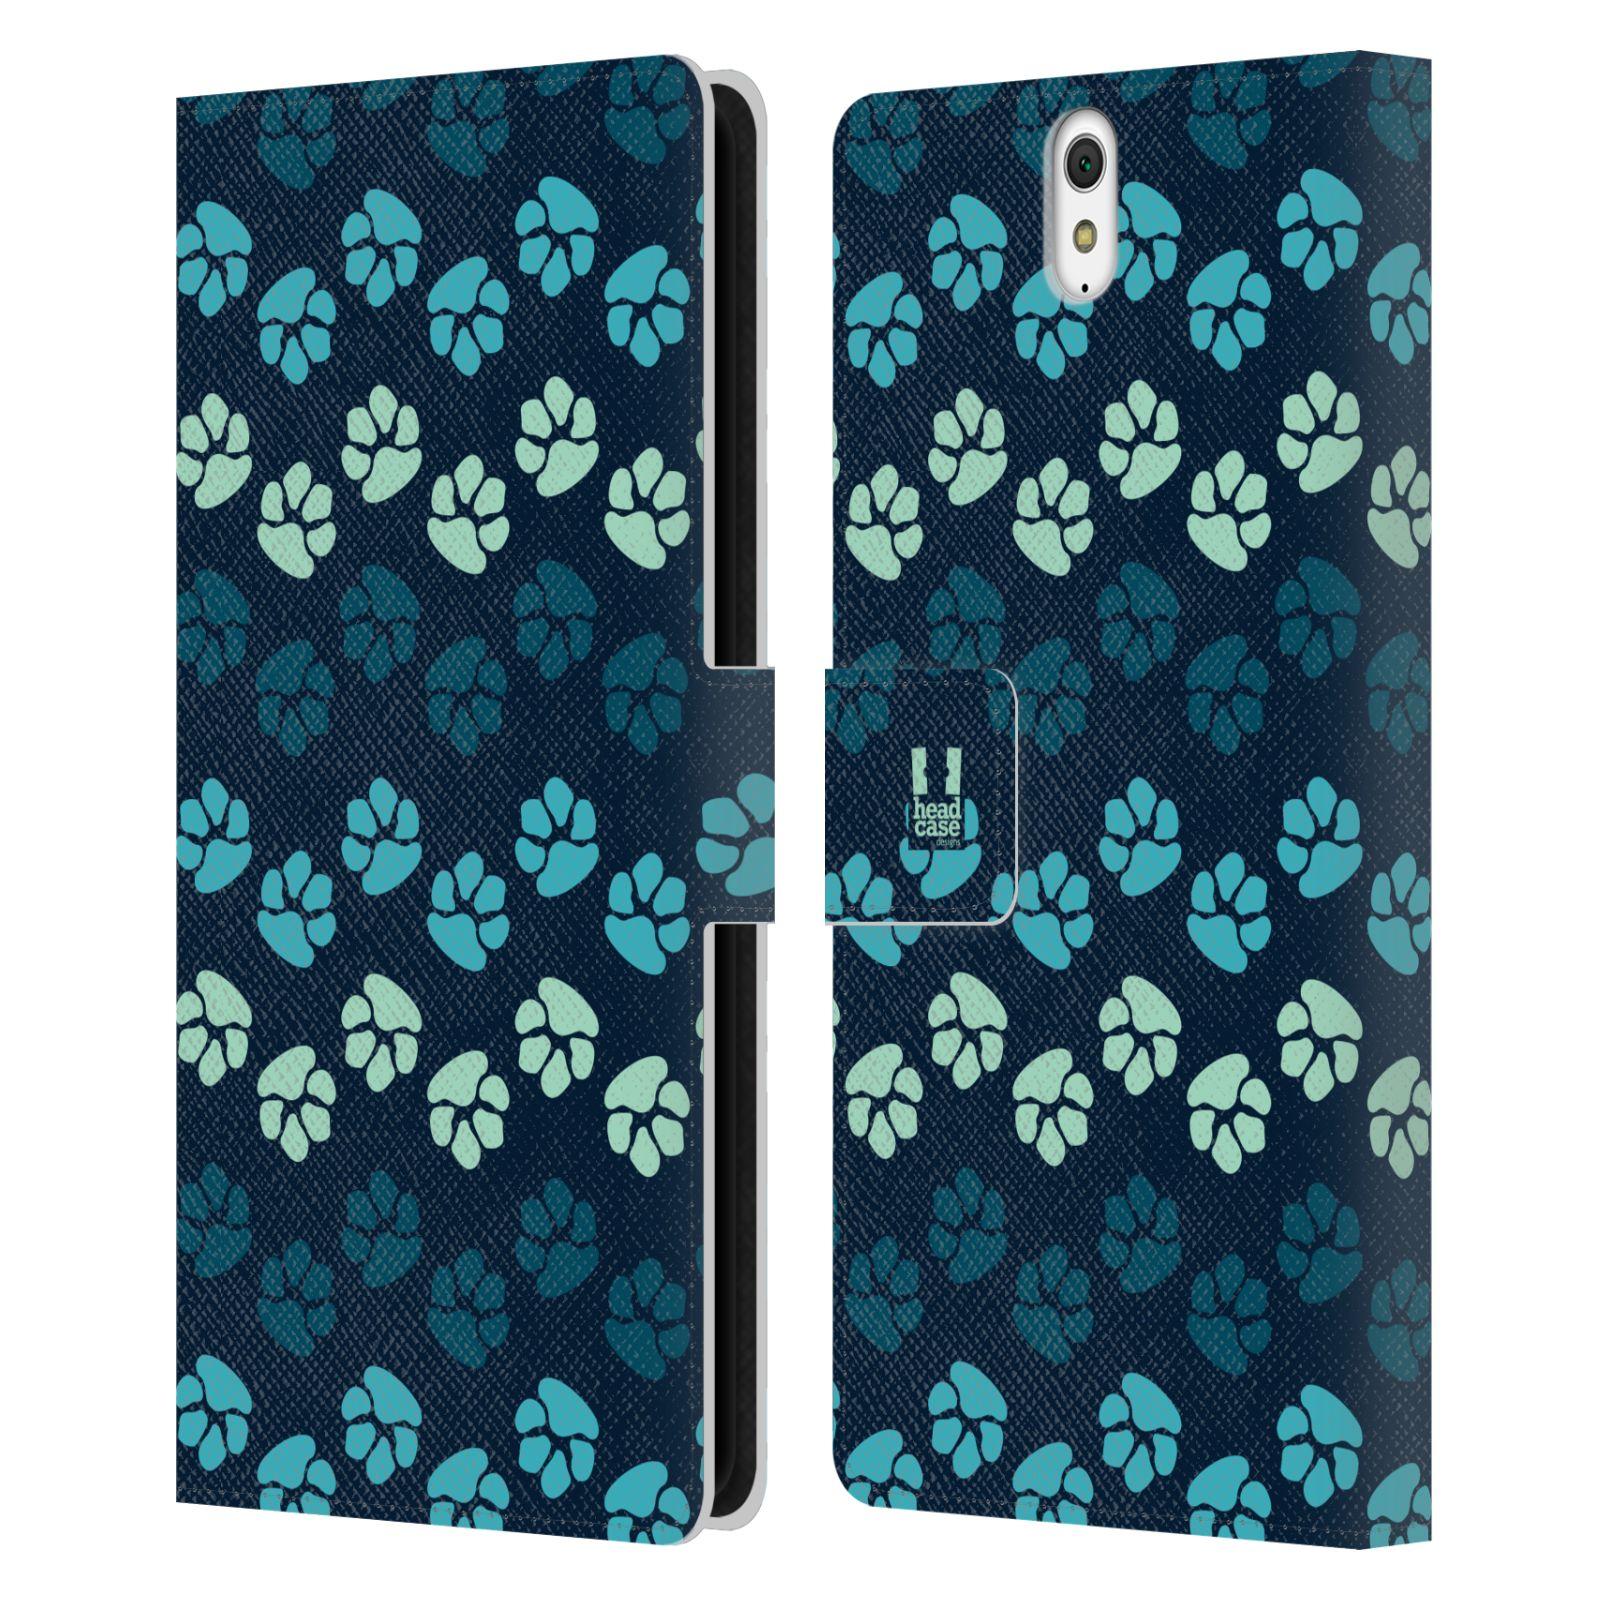 HEAD CASE Flipové pouzdro pro mobil SONY XPERIA C5 Ultra Pejsek ťapky modrá barva